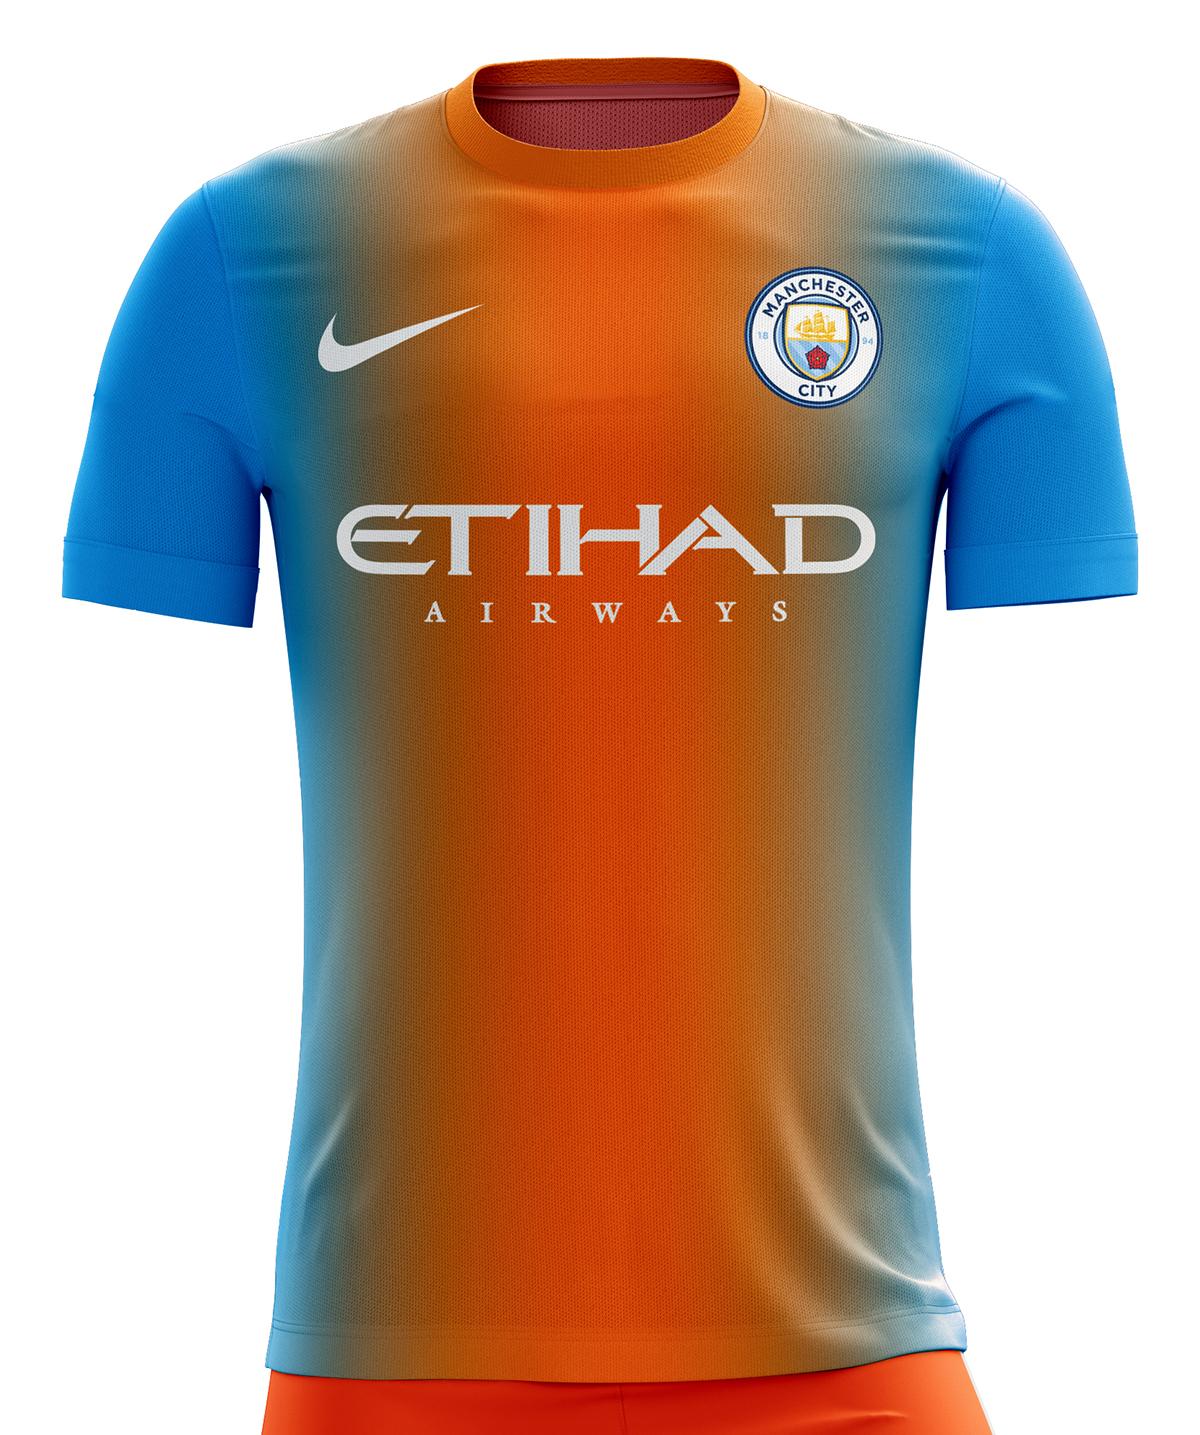 136a296f761 Manchester City Football Kit 16/17. on Behance